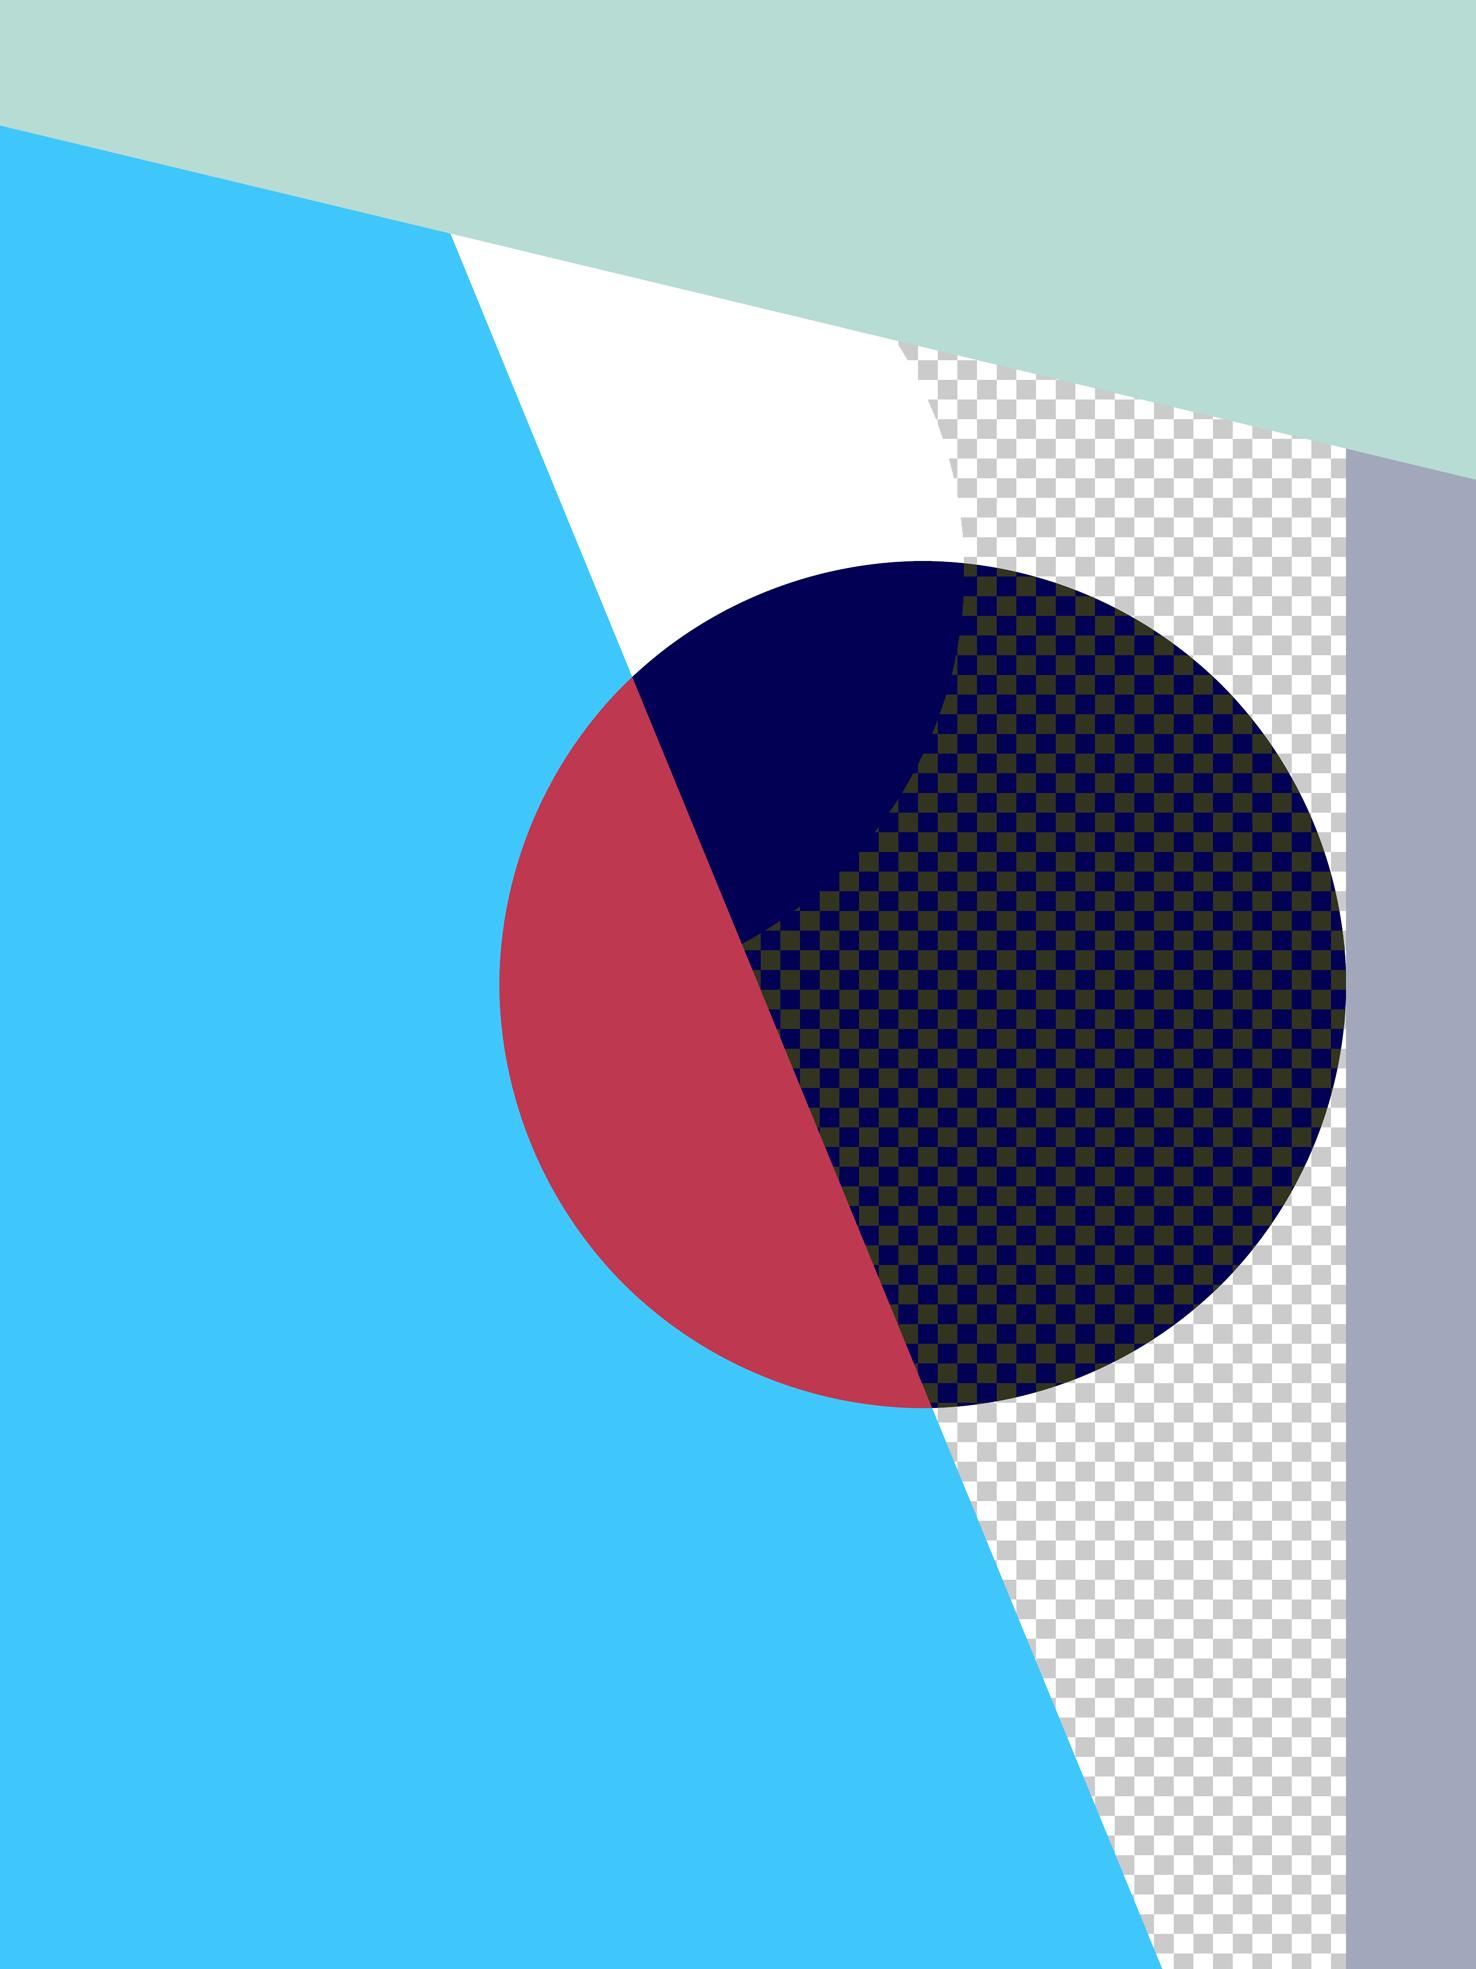 Blue Moon, 2016, C-Print, framed, 104 x 79 cm, Edition 3+1 AP.